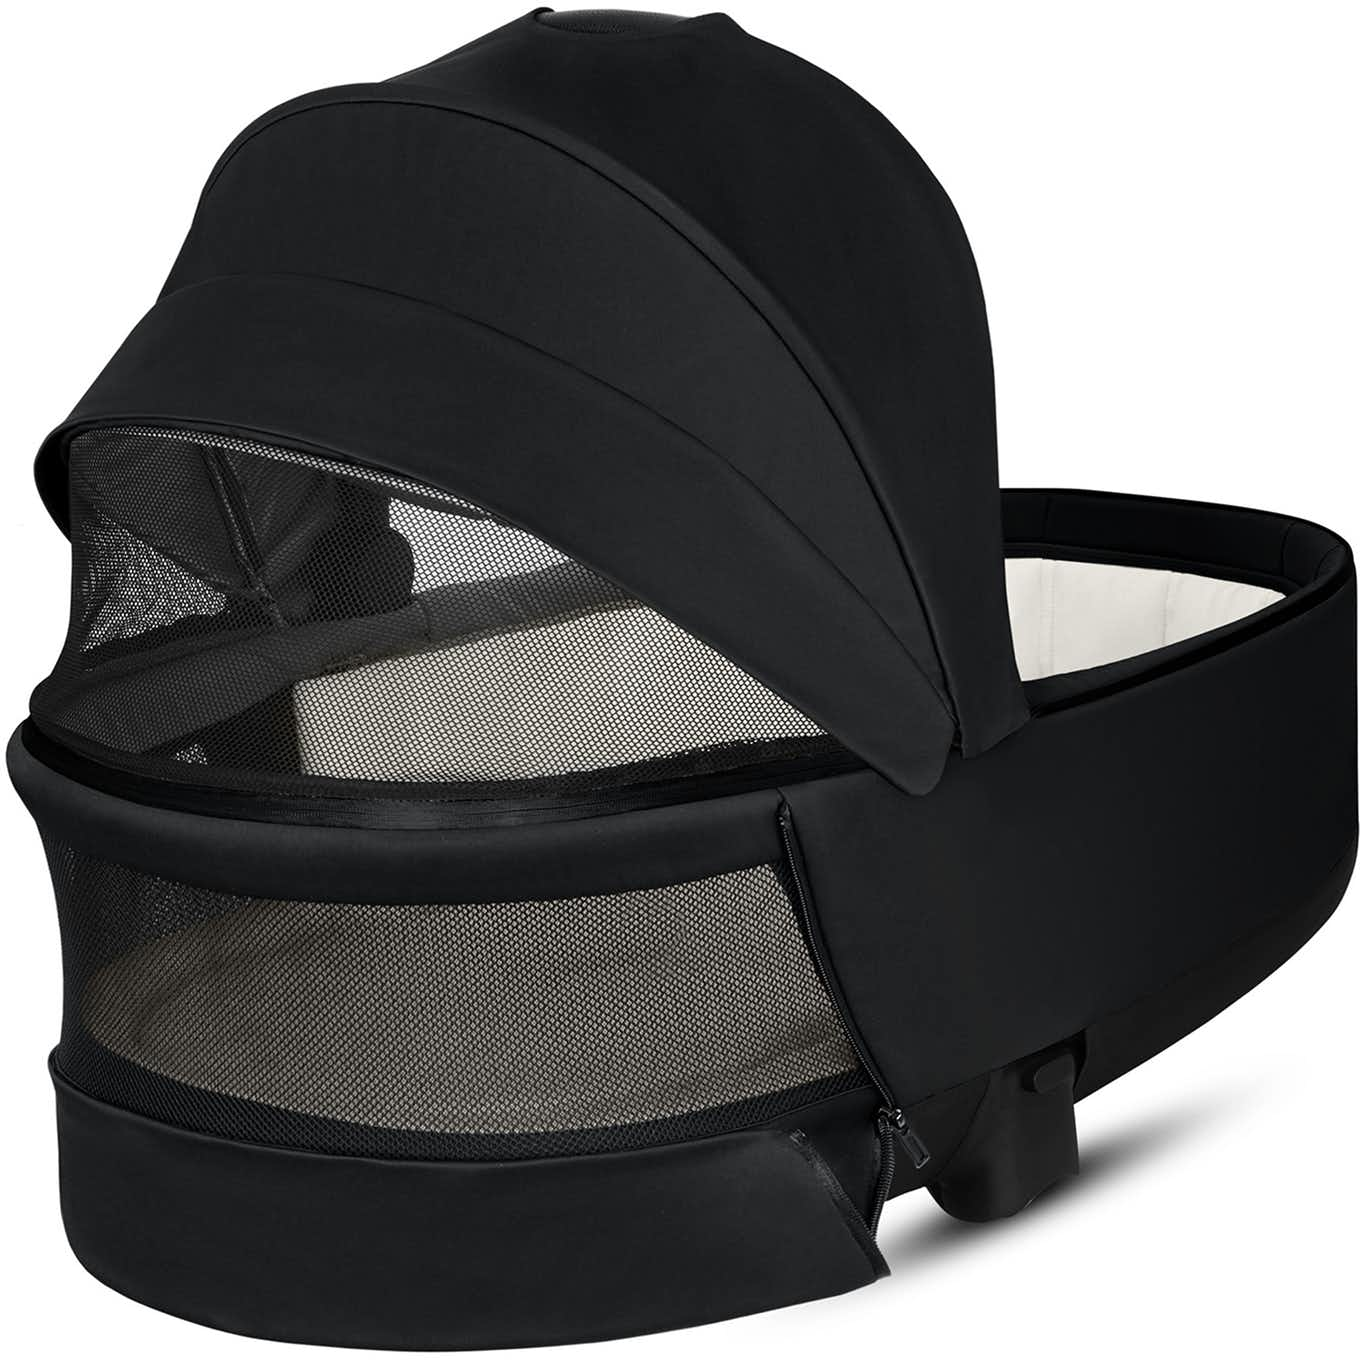 The Baby Room Cybex Priam Carrycot Lux Premium Black 03